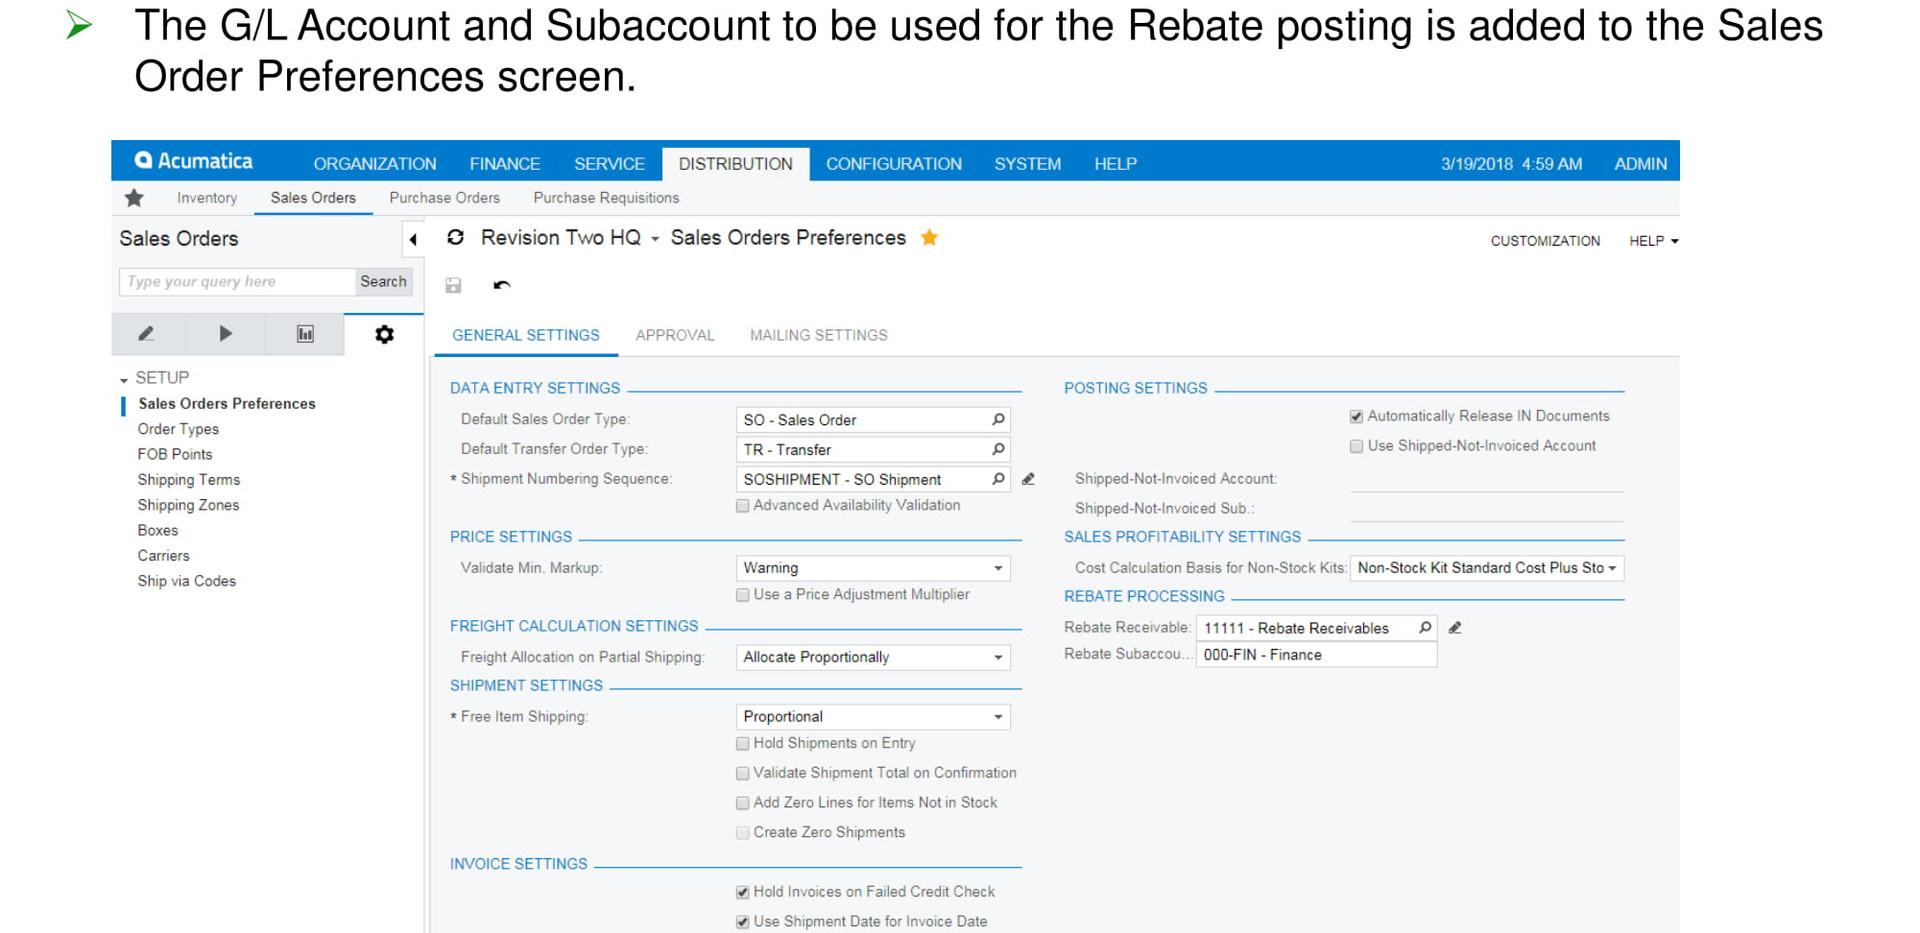 Rebate_Processing PP-08.jpg